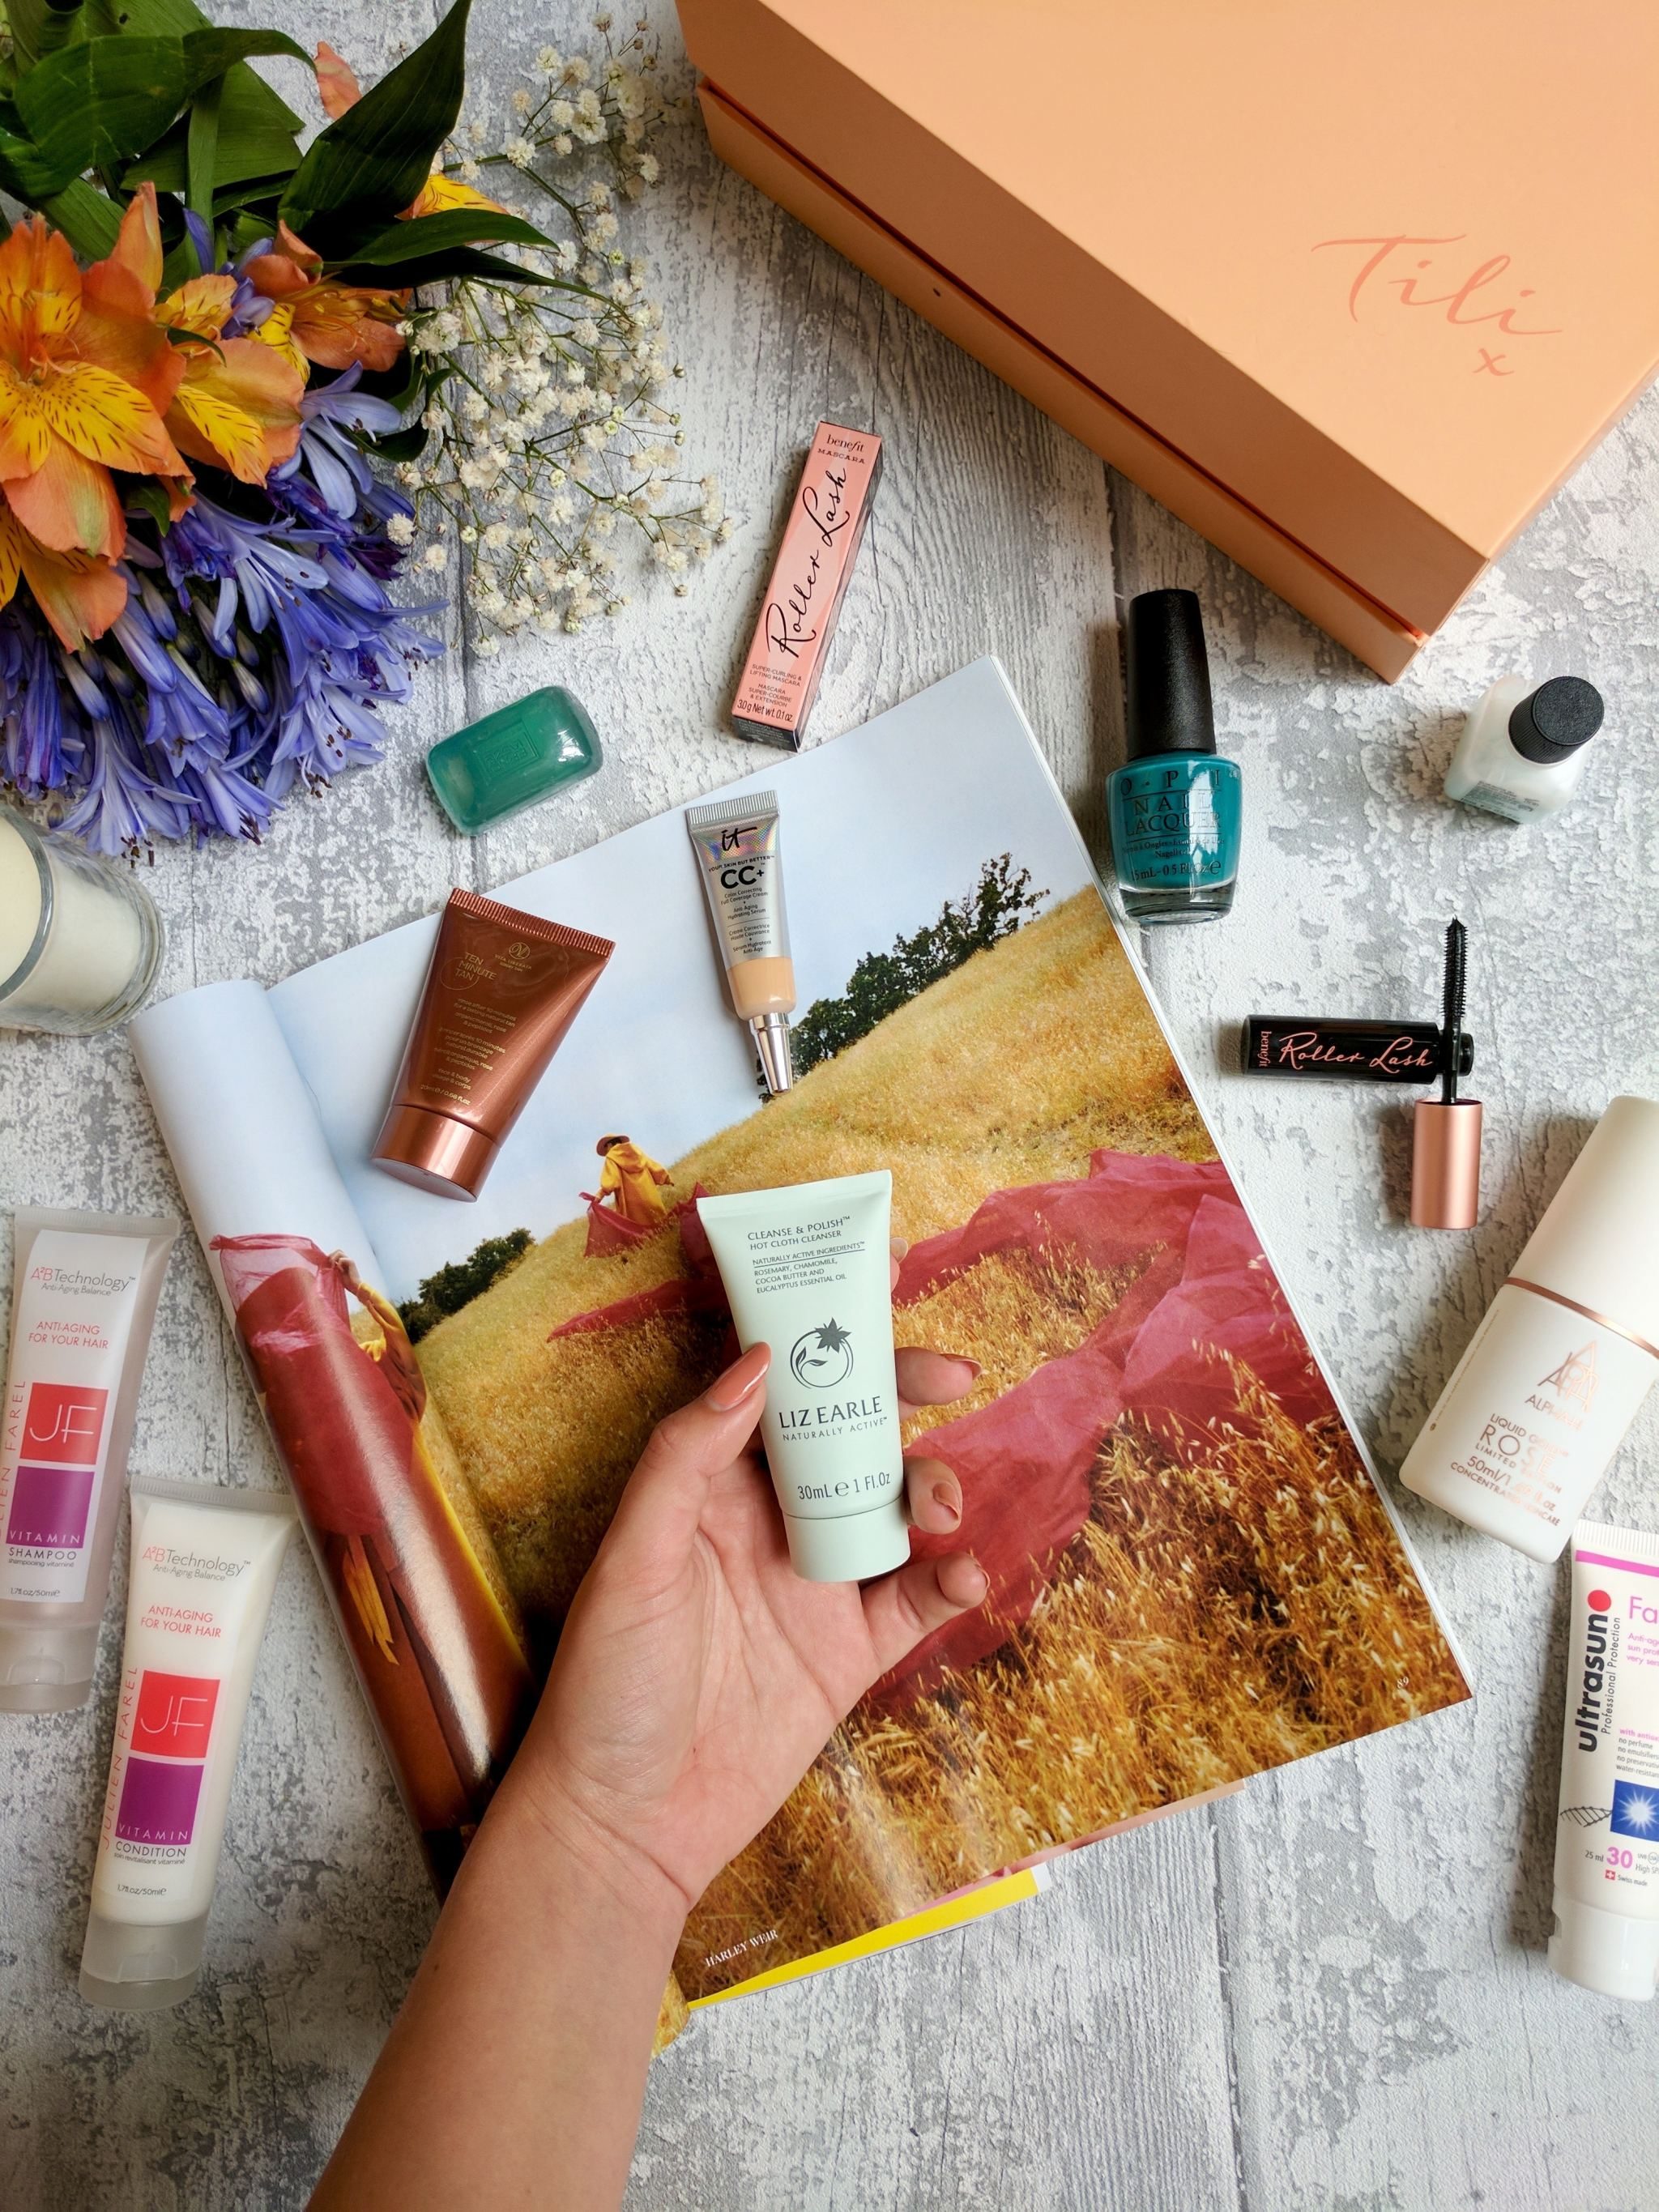 Introducing Tili – The dream beauty box